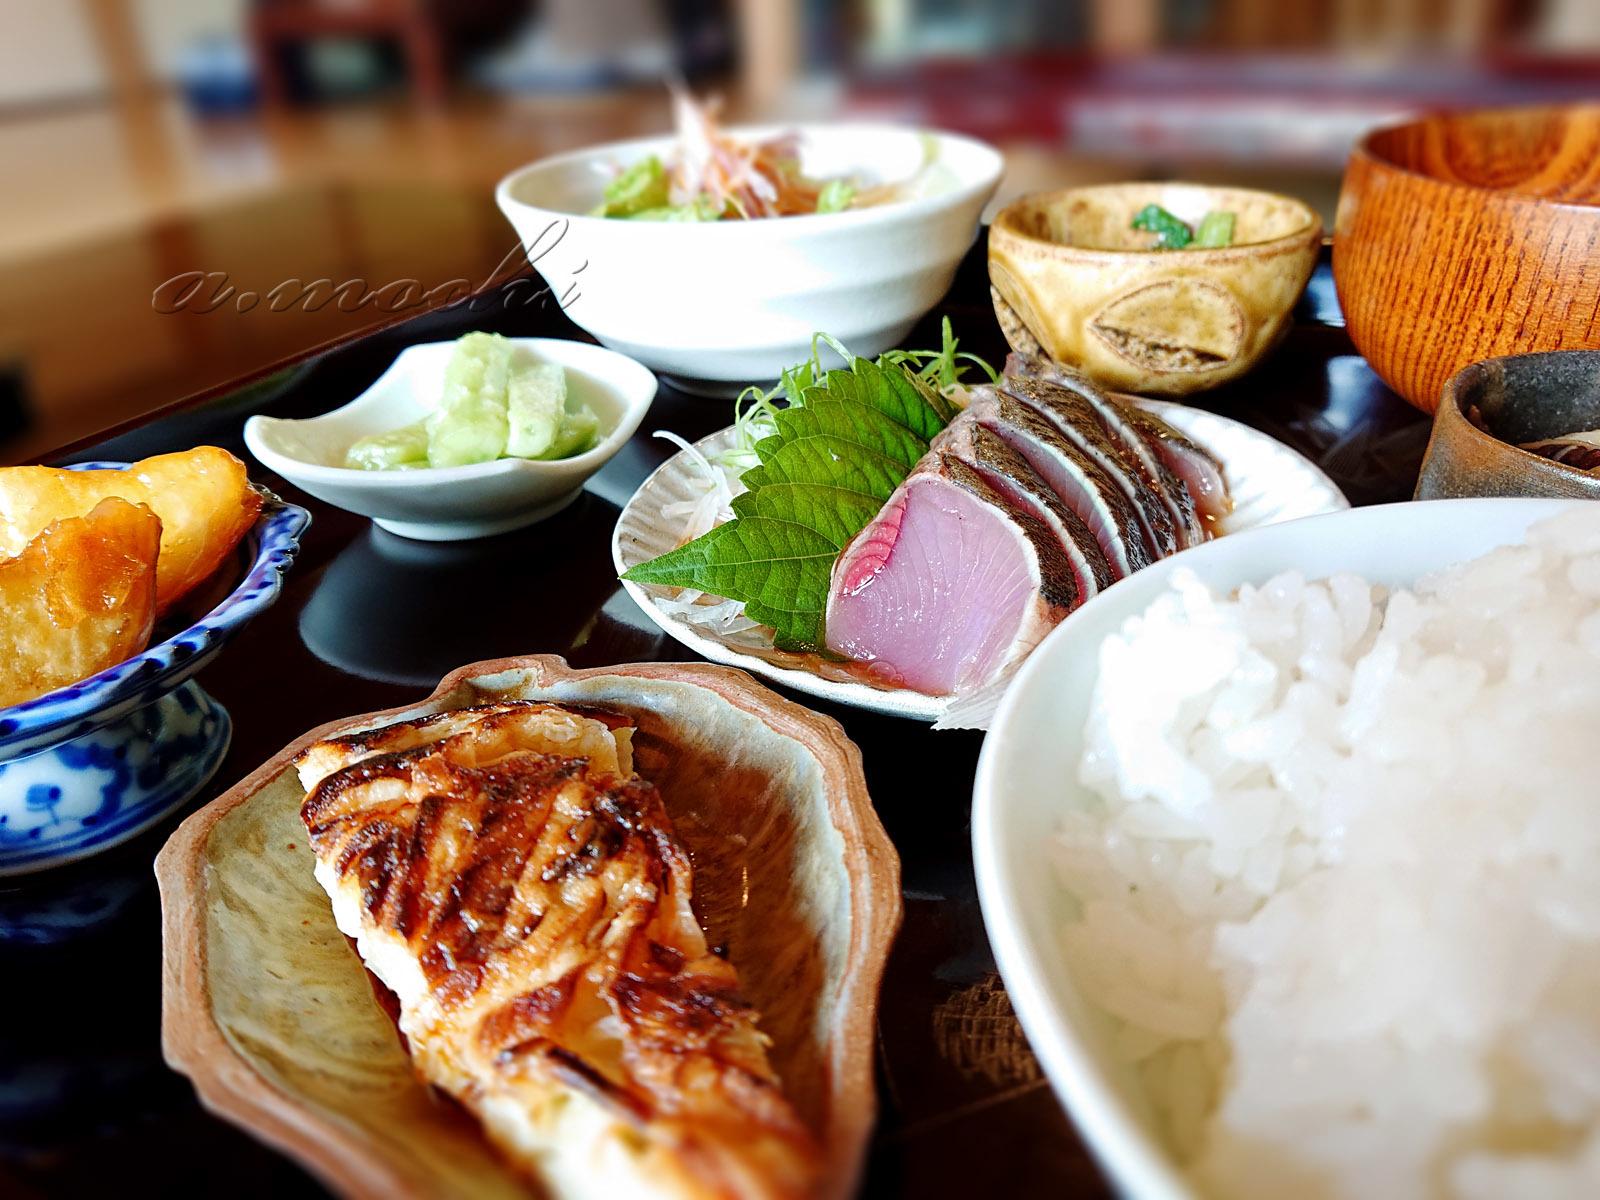 hikari_lunch0.jpg